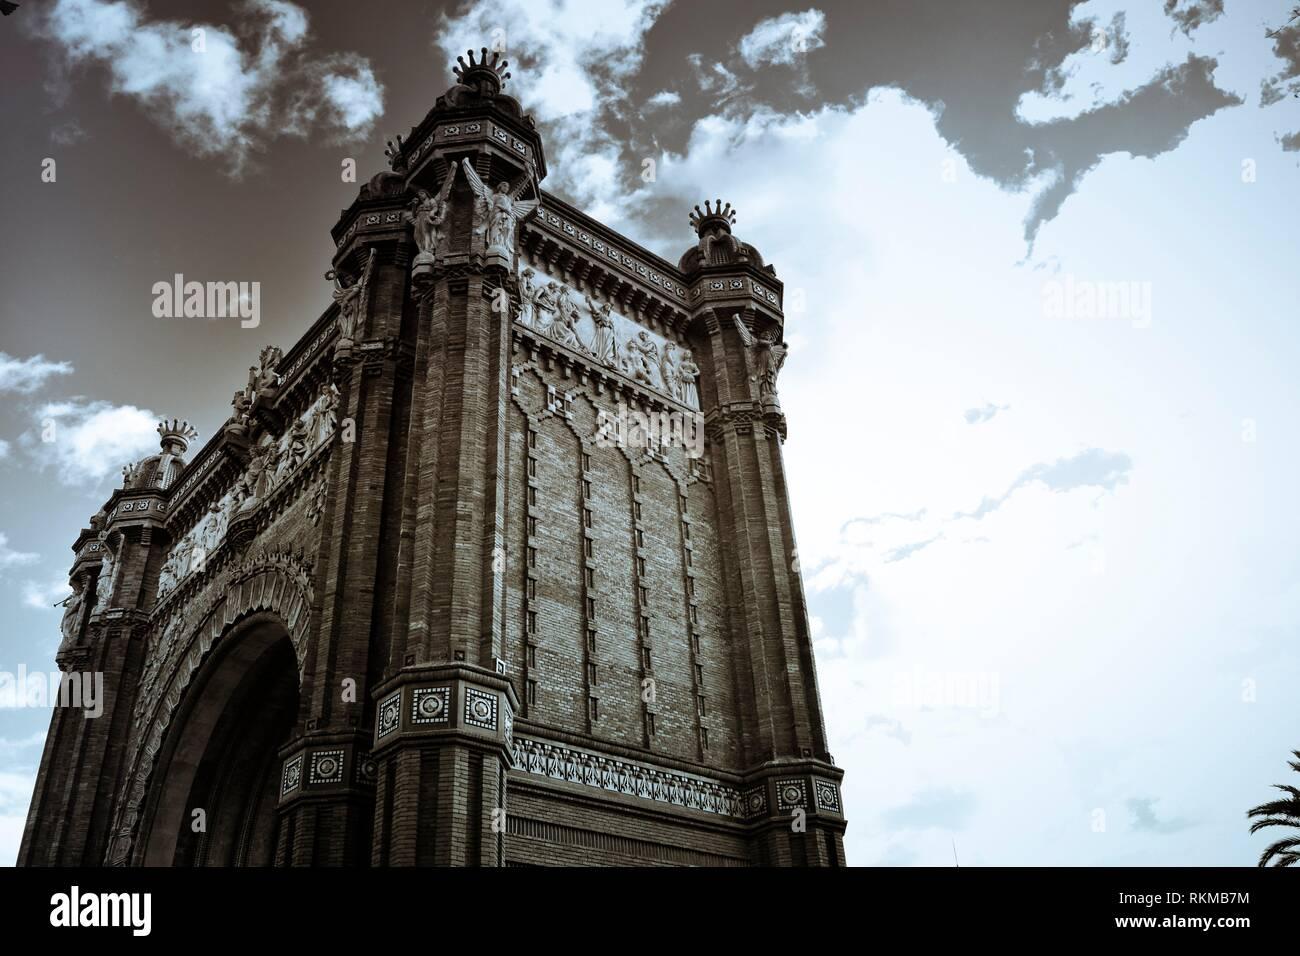 Arc de Triomf monument. Passeig Lluis Companys, Barcelona, Catalonia, Spain. - Stock Image